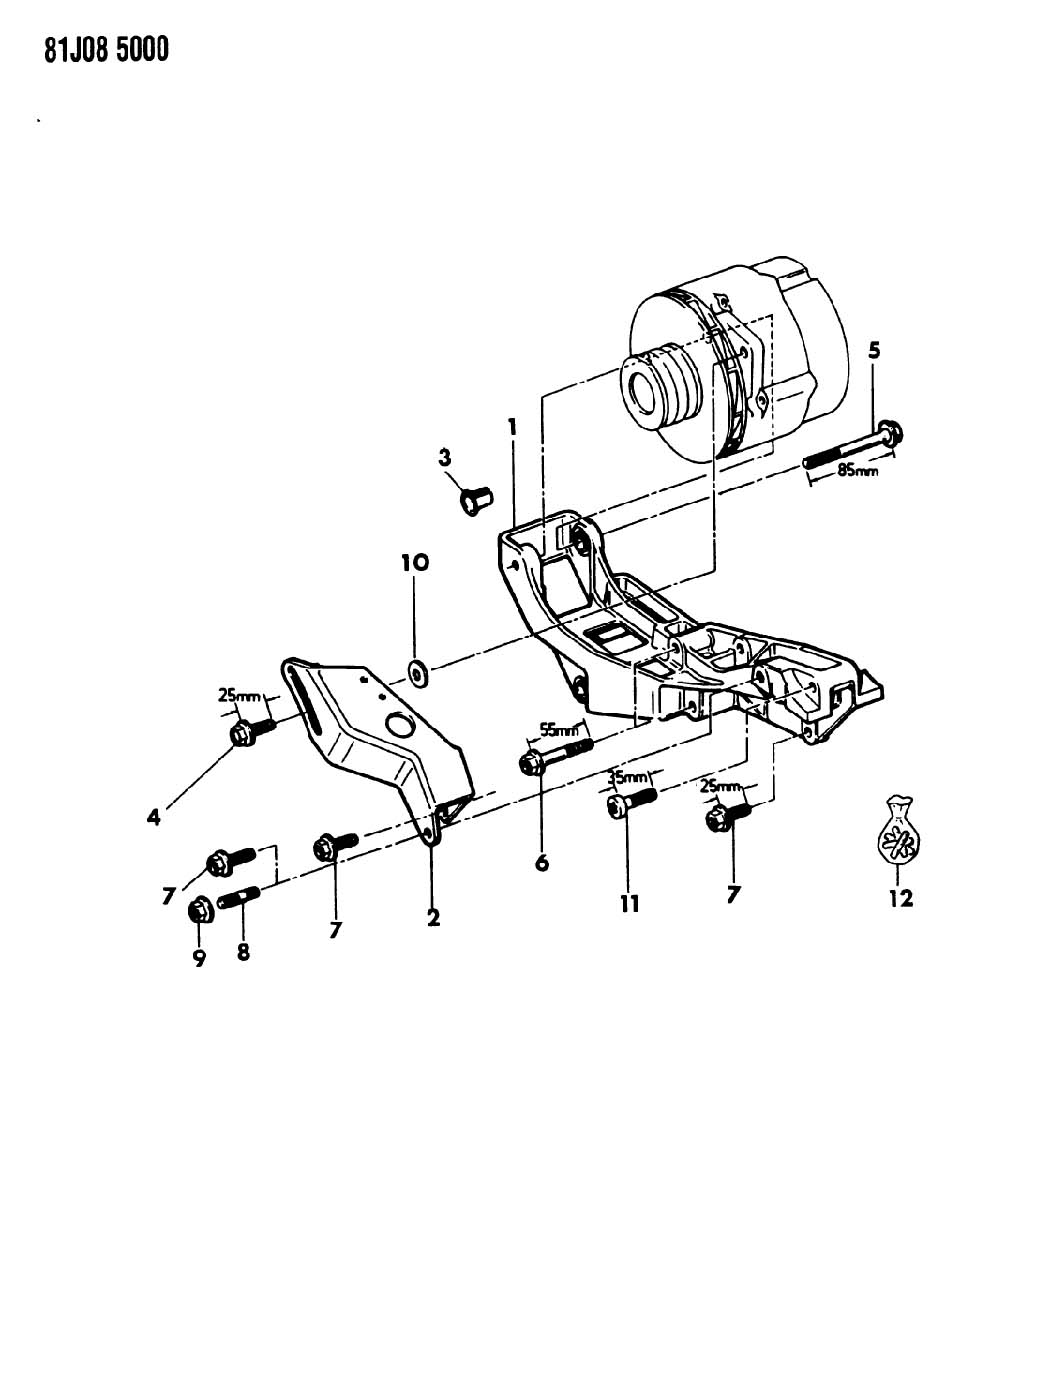 Jeep Wrangler Alternator Mounting Six Cylinder Xj